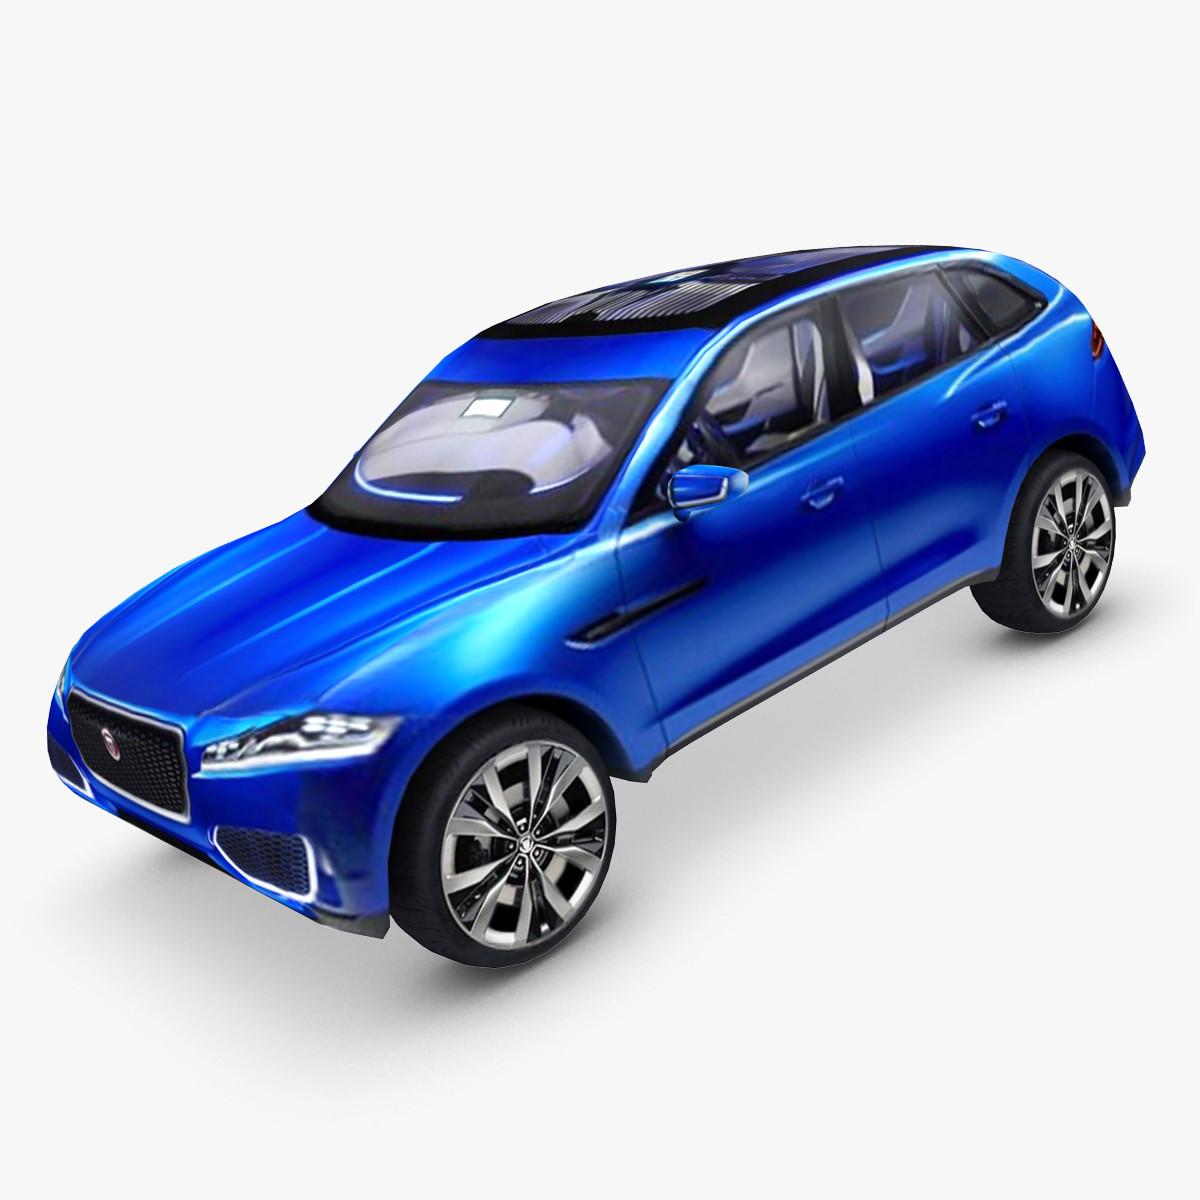 Jaguar-Reveals_C-X17_Rr_01.jpg